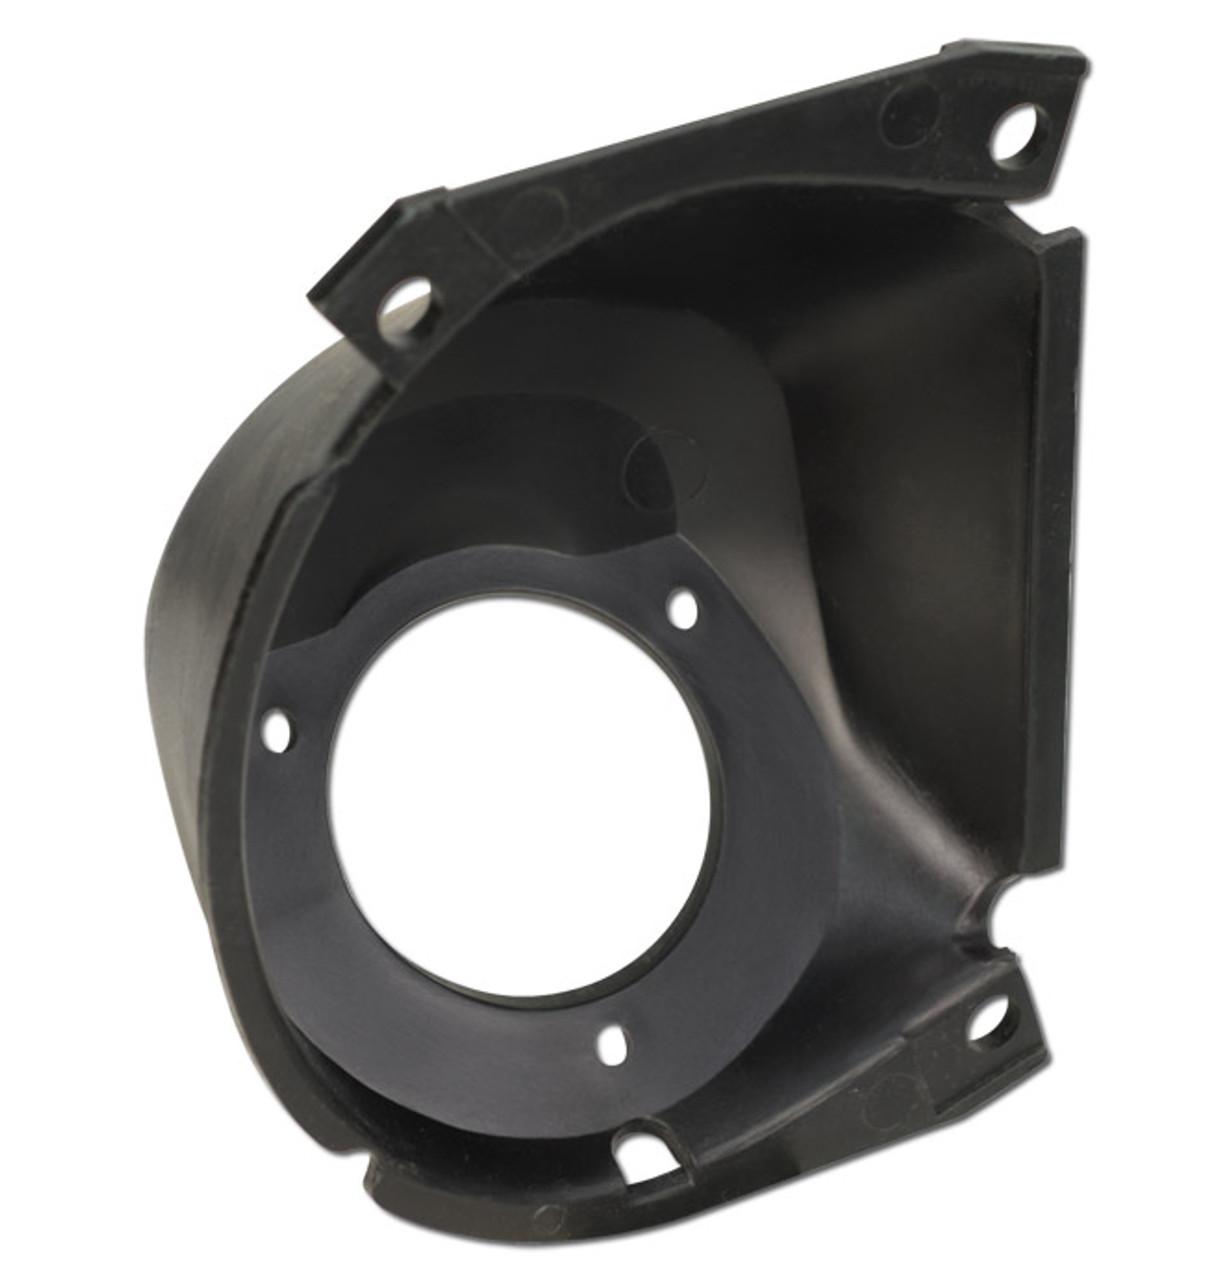 Front Brake Rotors /& Ceramic Pads 34334 CD1098 06-09 Range Rover 4.4L 2